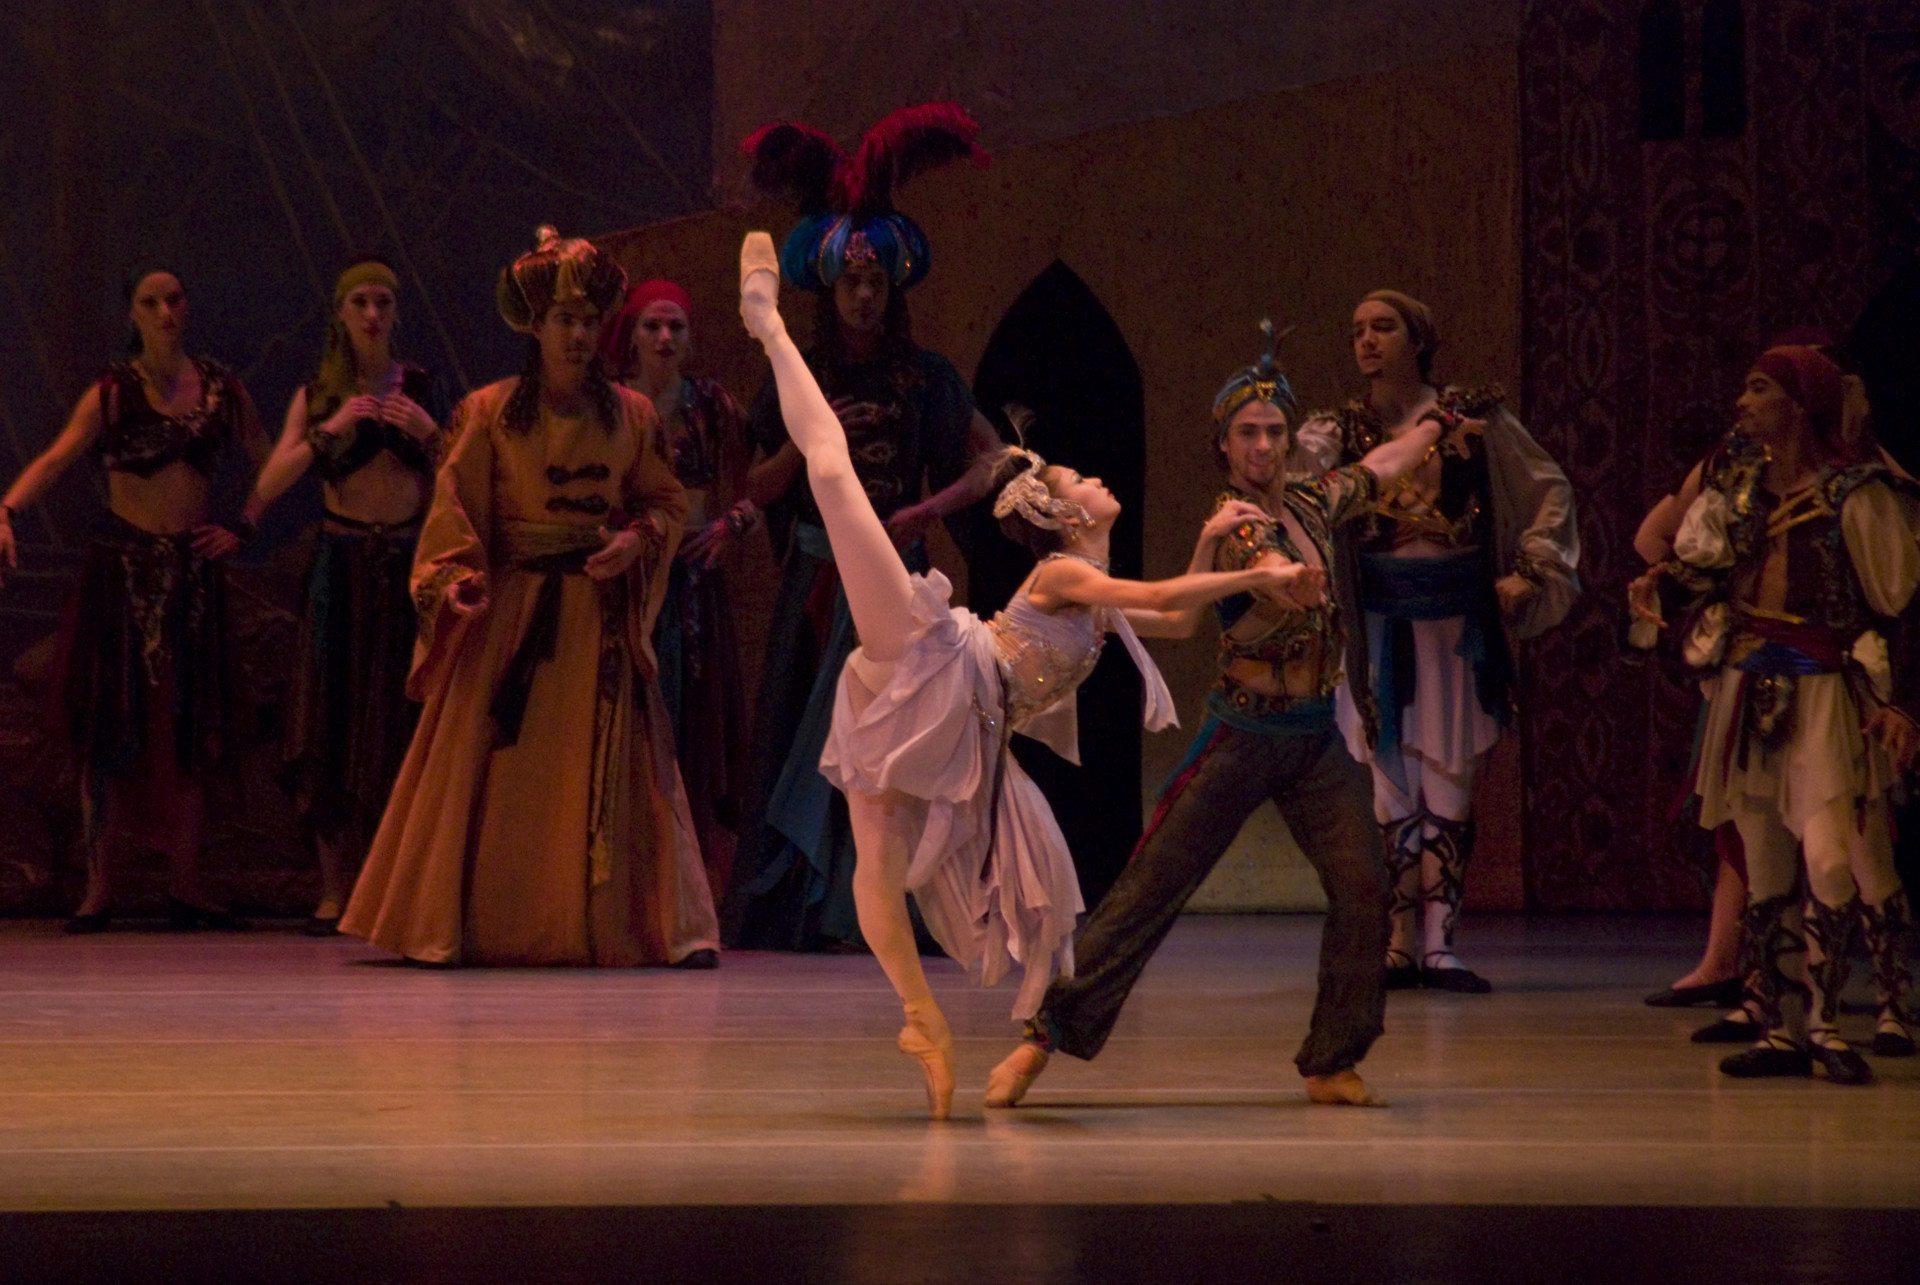 cuban classical ballet of miami miami dade county auditorium